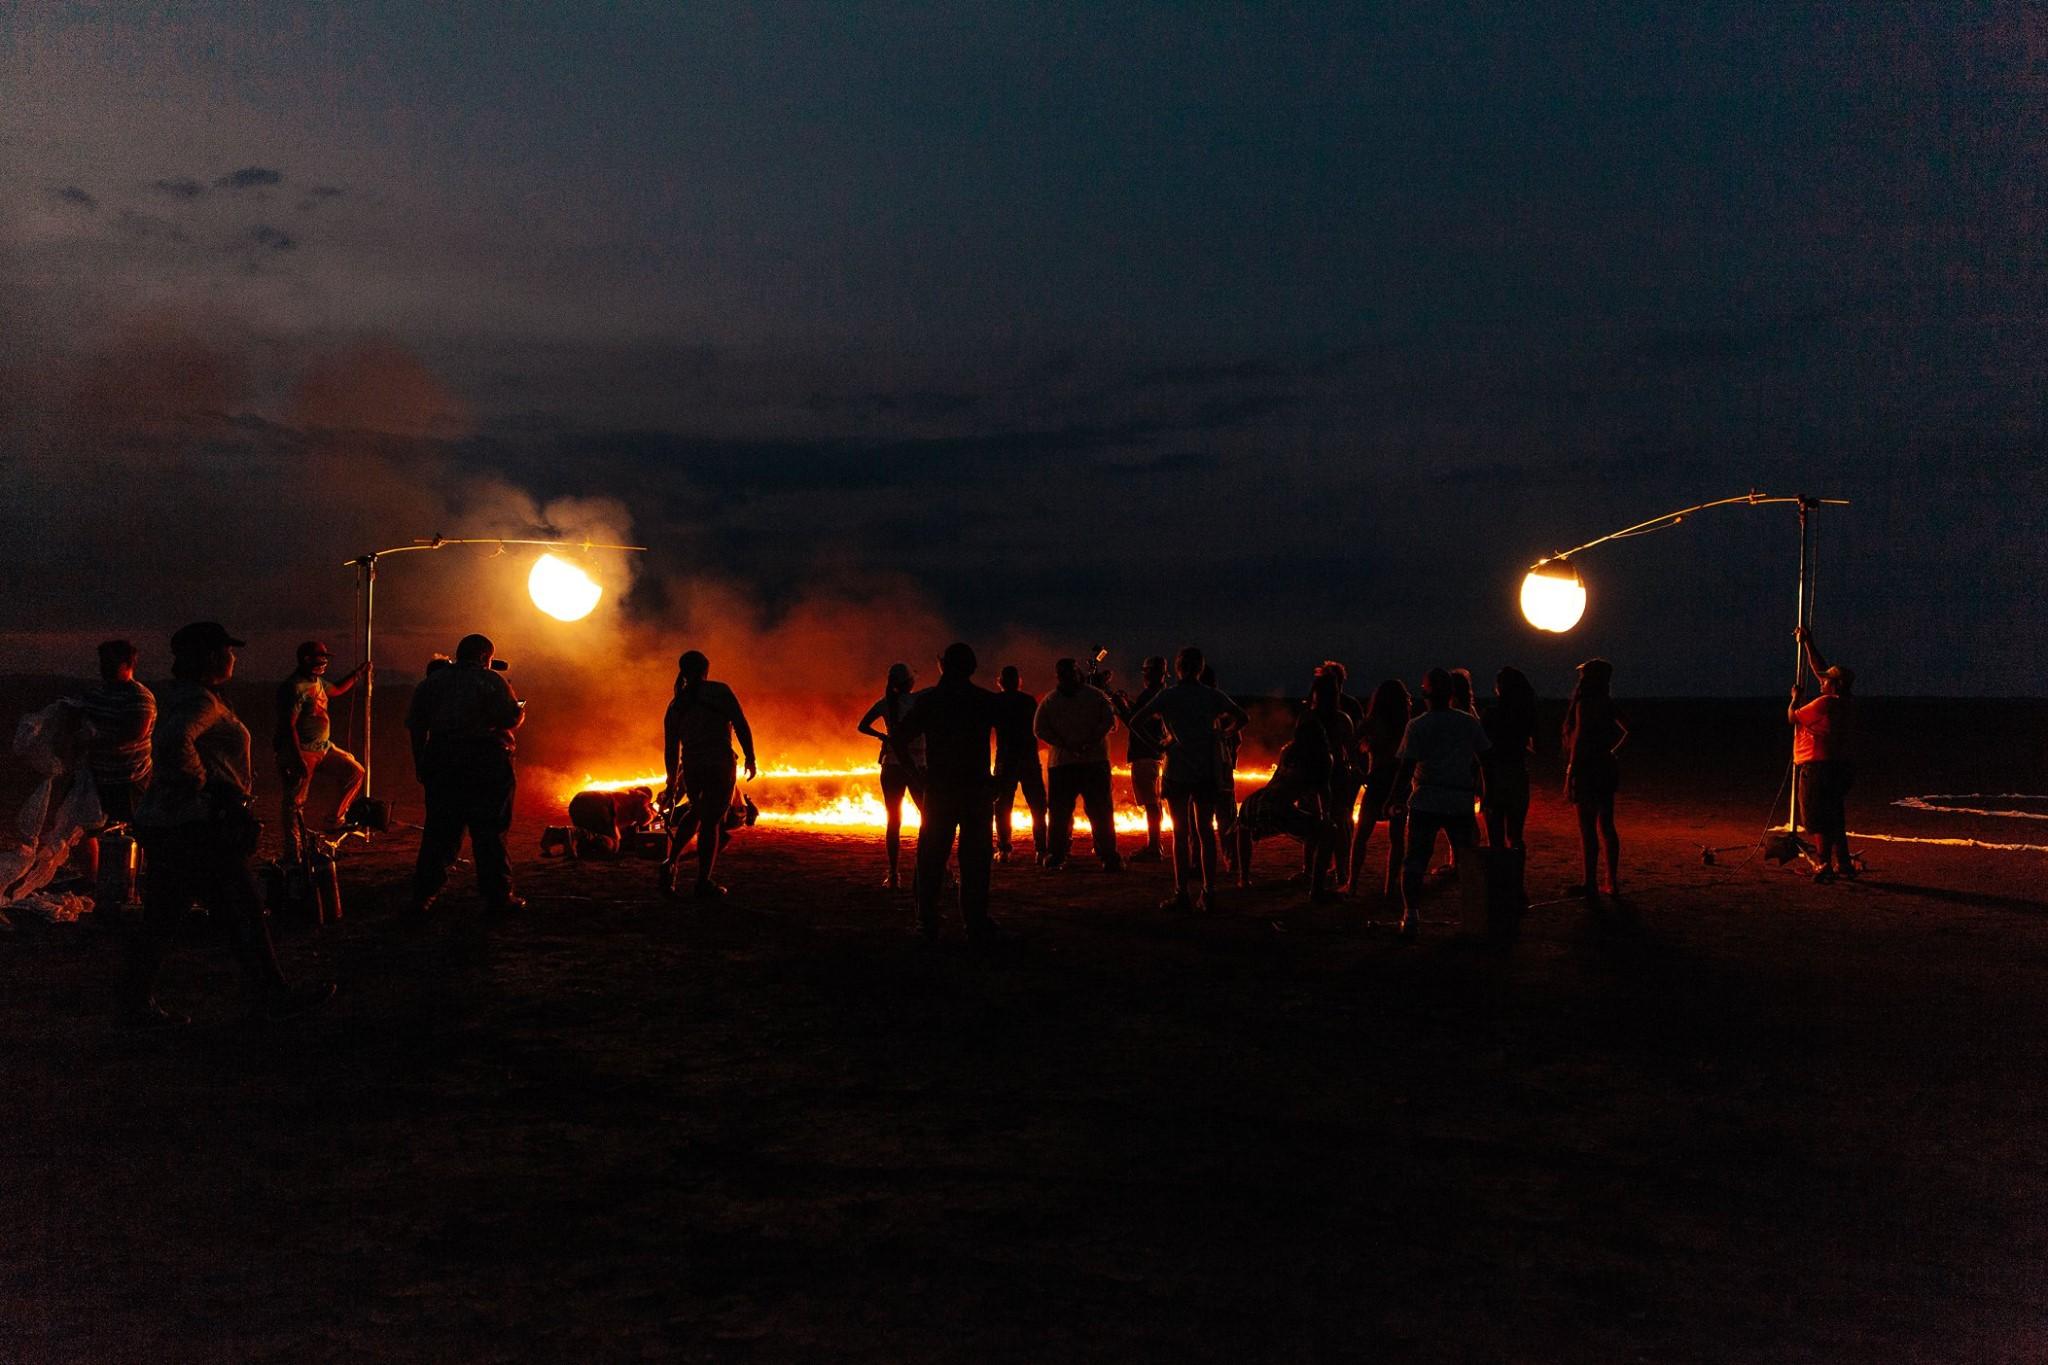 Final setup in the desert.  Photo credit: Yasha Malekzad